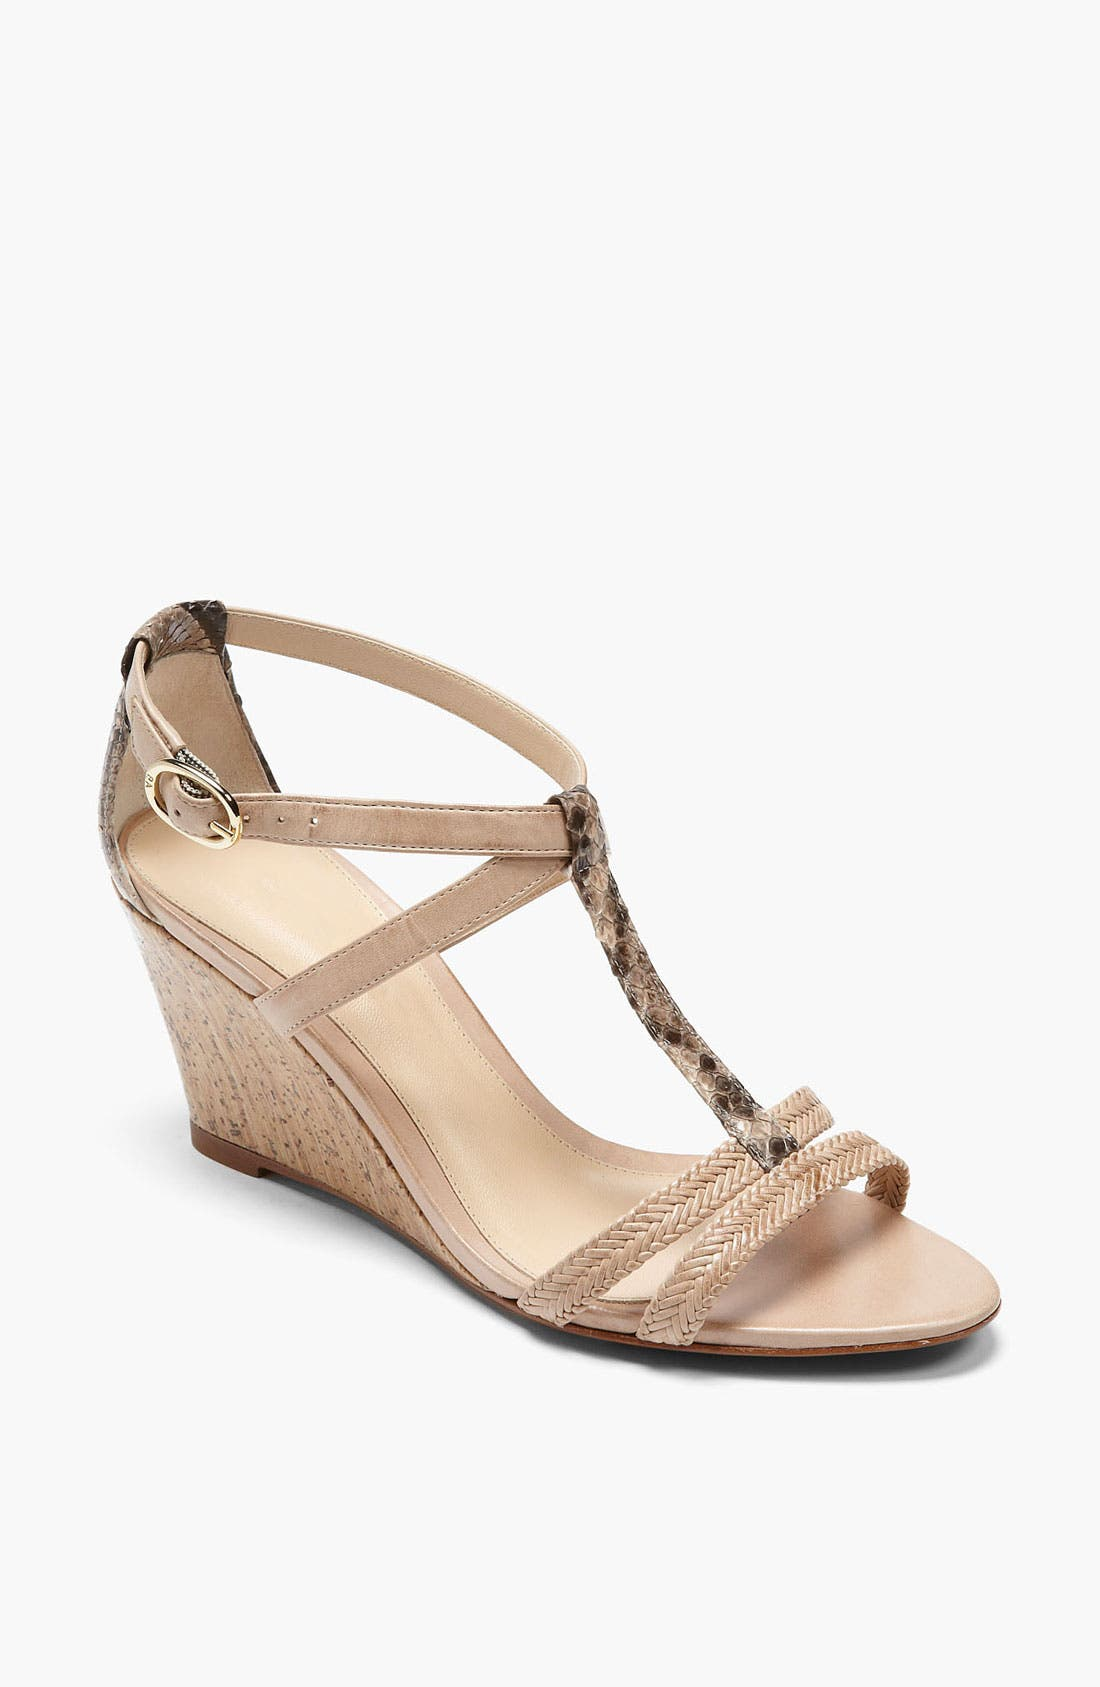 Main Image - Alexandre Birman Braid Cork Sandal